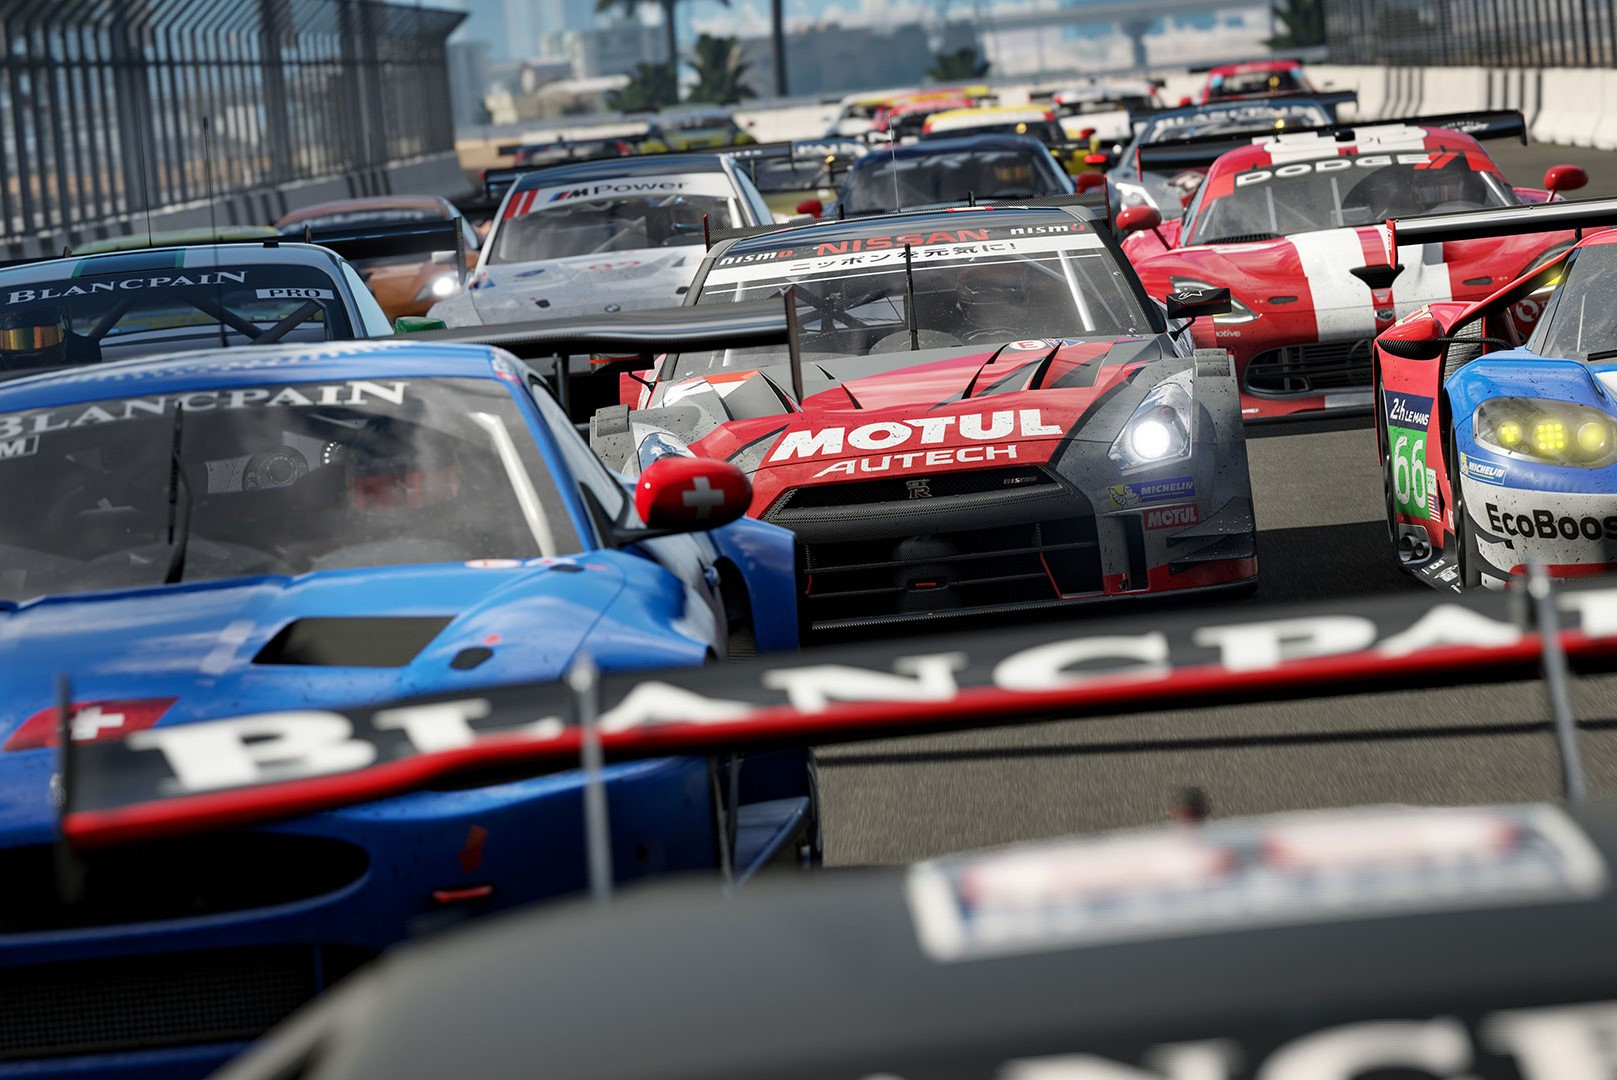 خرید سی دی کی Forza Motorsport 7 اسکرین شات 2